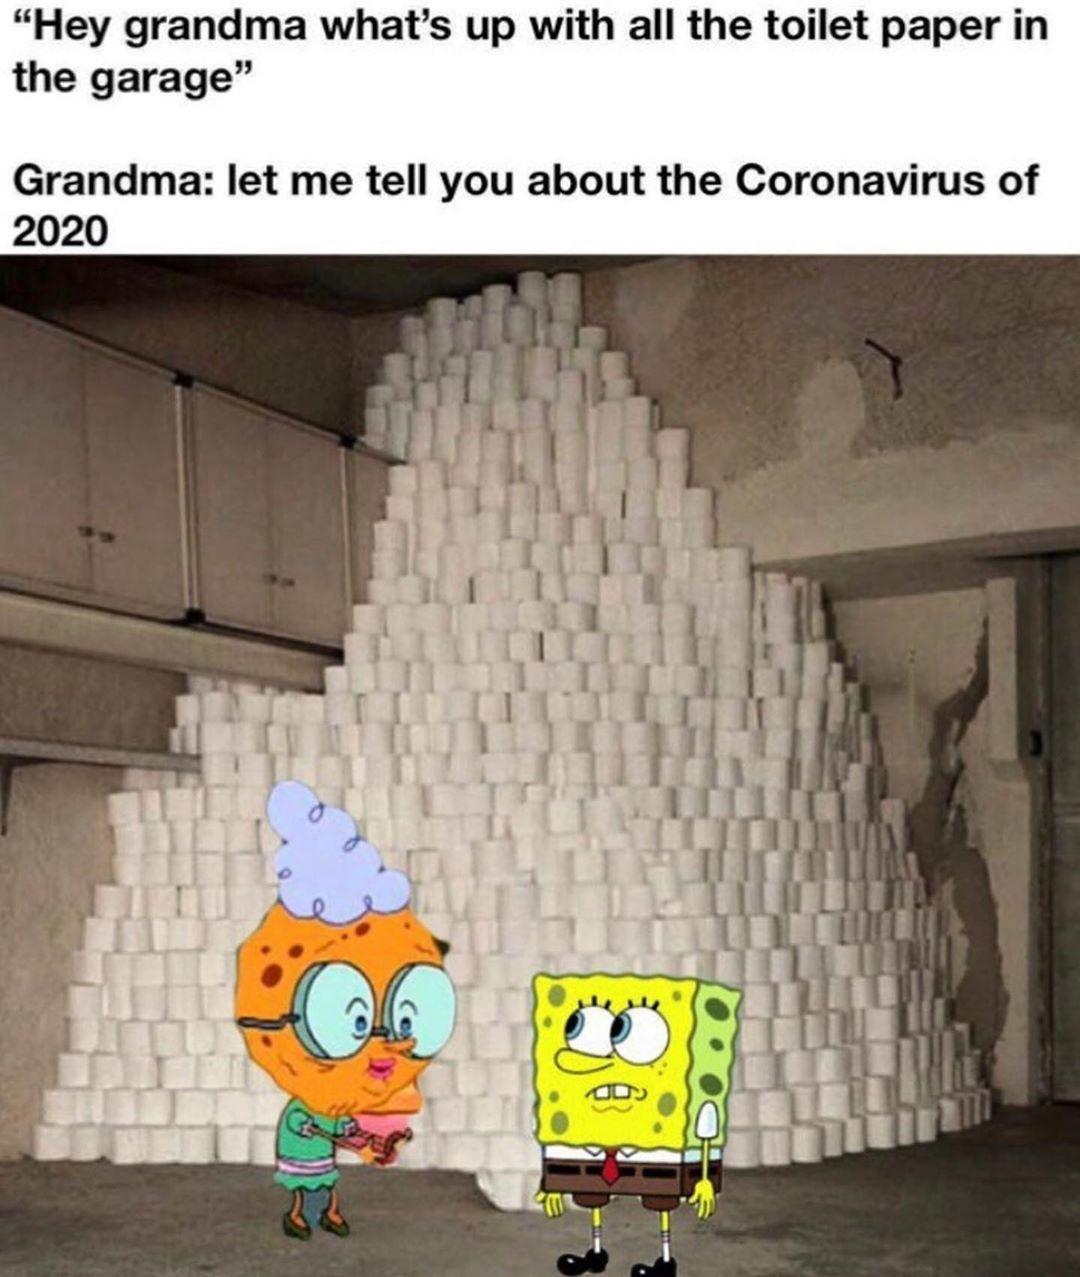 Meme S Quotes Memes Its Memes Laughing Memes Memes Quotes Funnie Memes I Meme Truthful Memes Funny Spongebob Memes Really Funny Memes Crazy Funny Memes